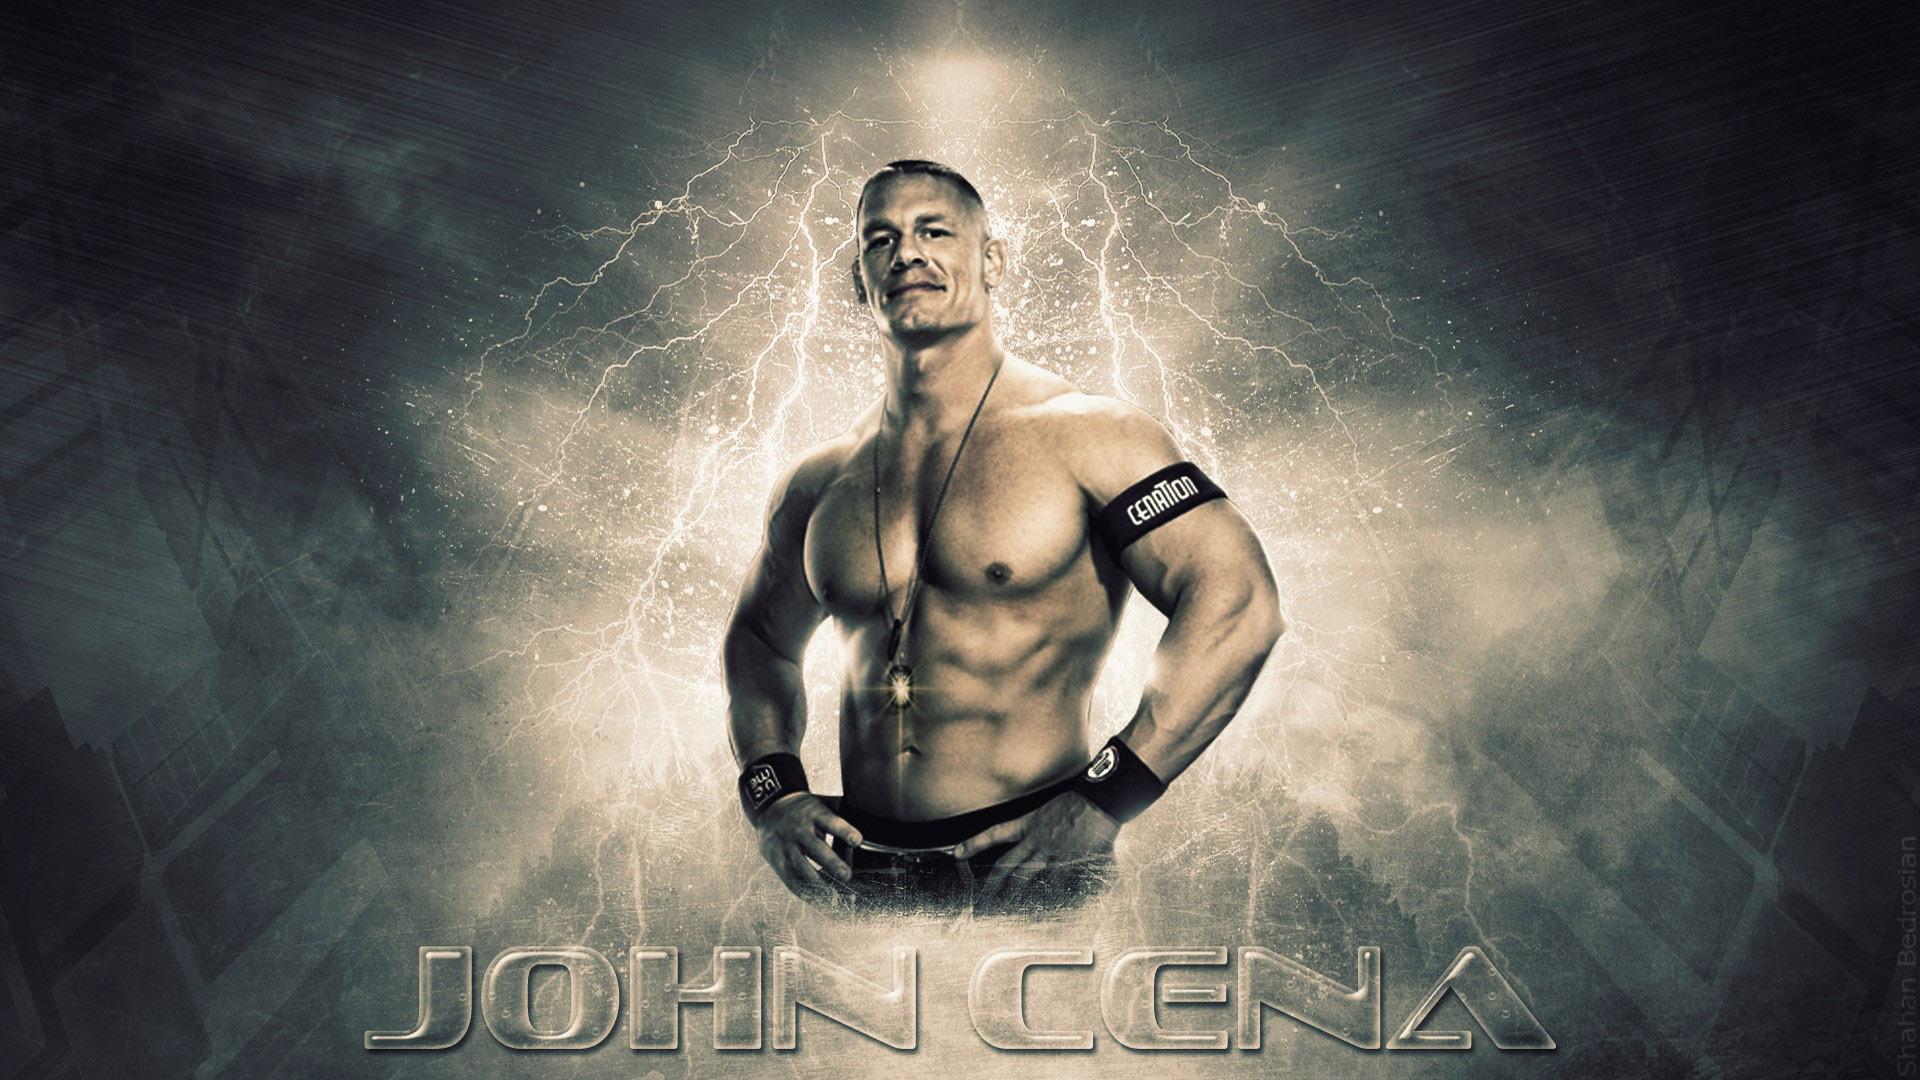 John Cena Poster